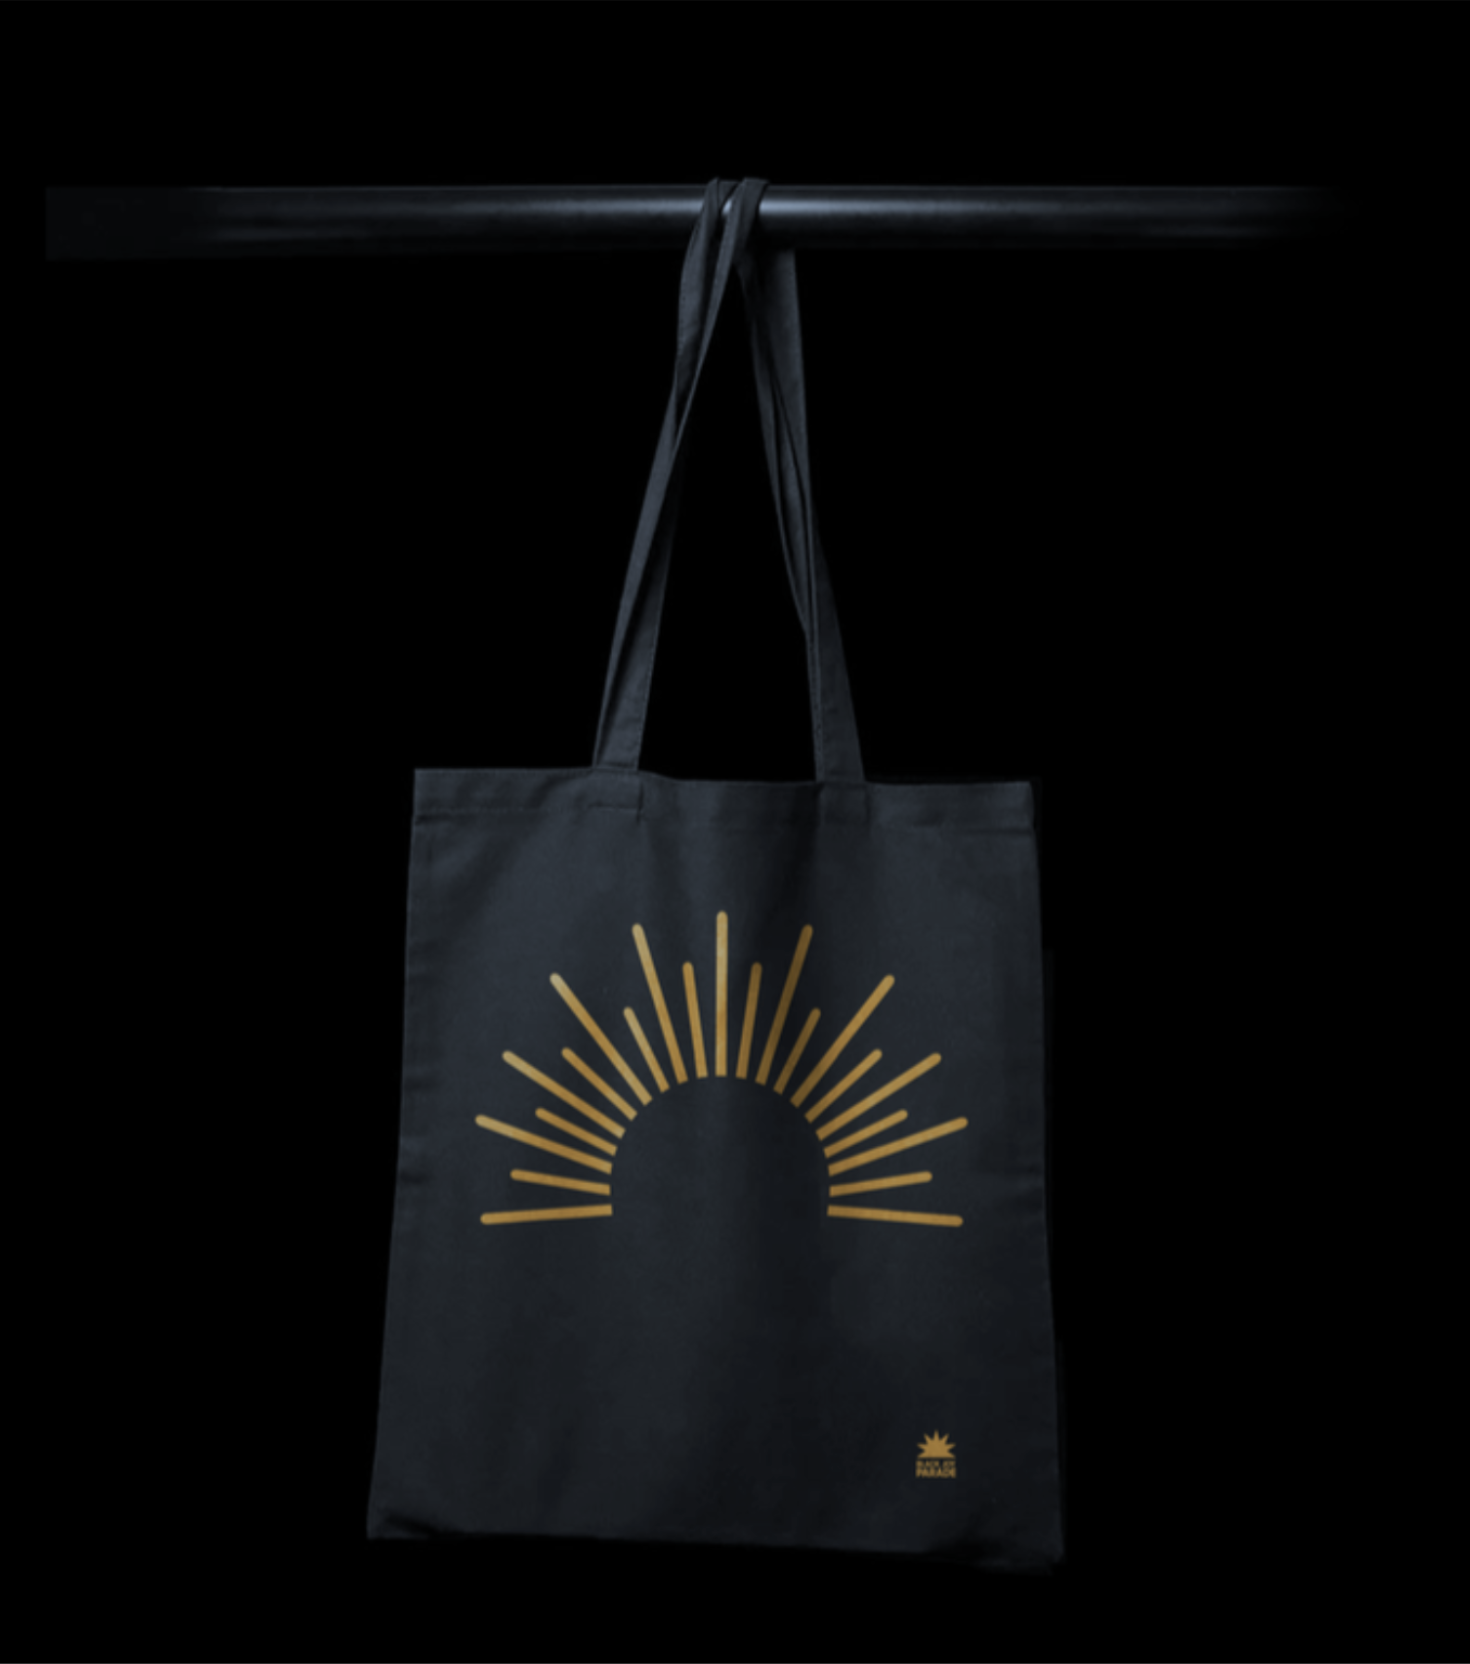 2019 Bag